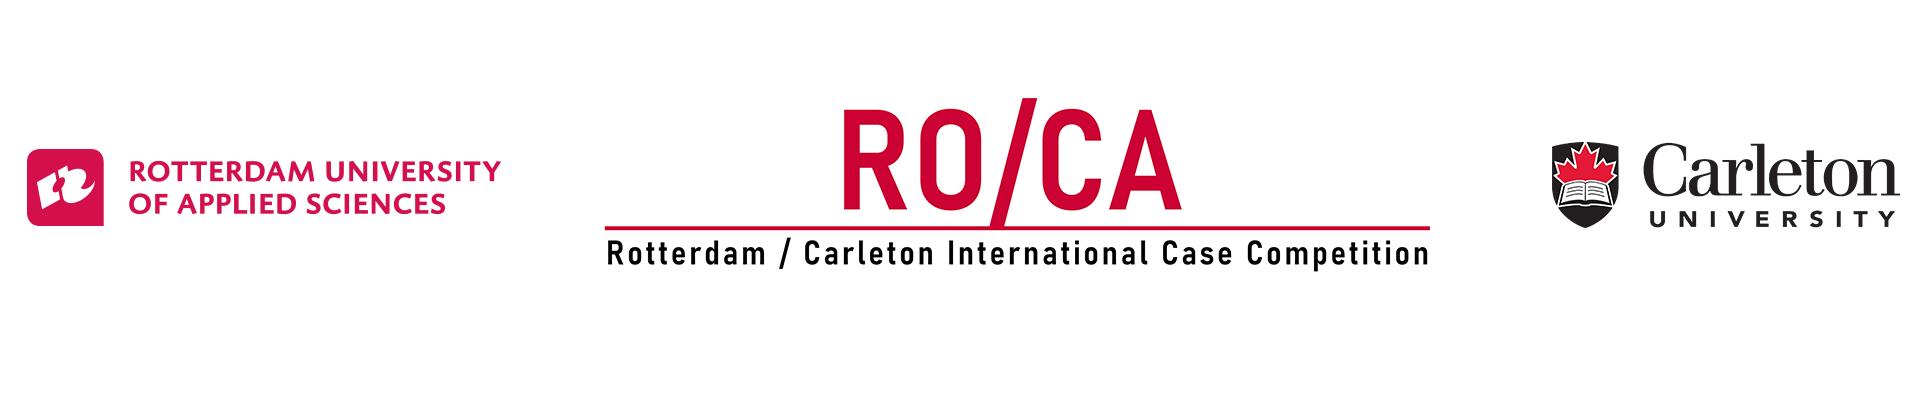 1. ROCA 2020 EVENTS  ROTTERDAM – CARLETON INTERNATIONAL CASE COMPETITION